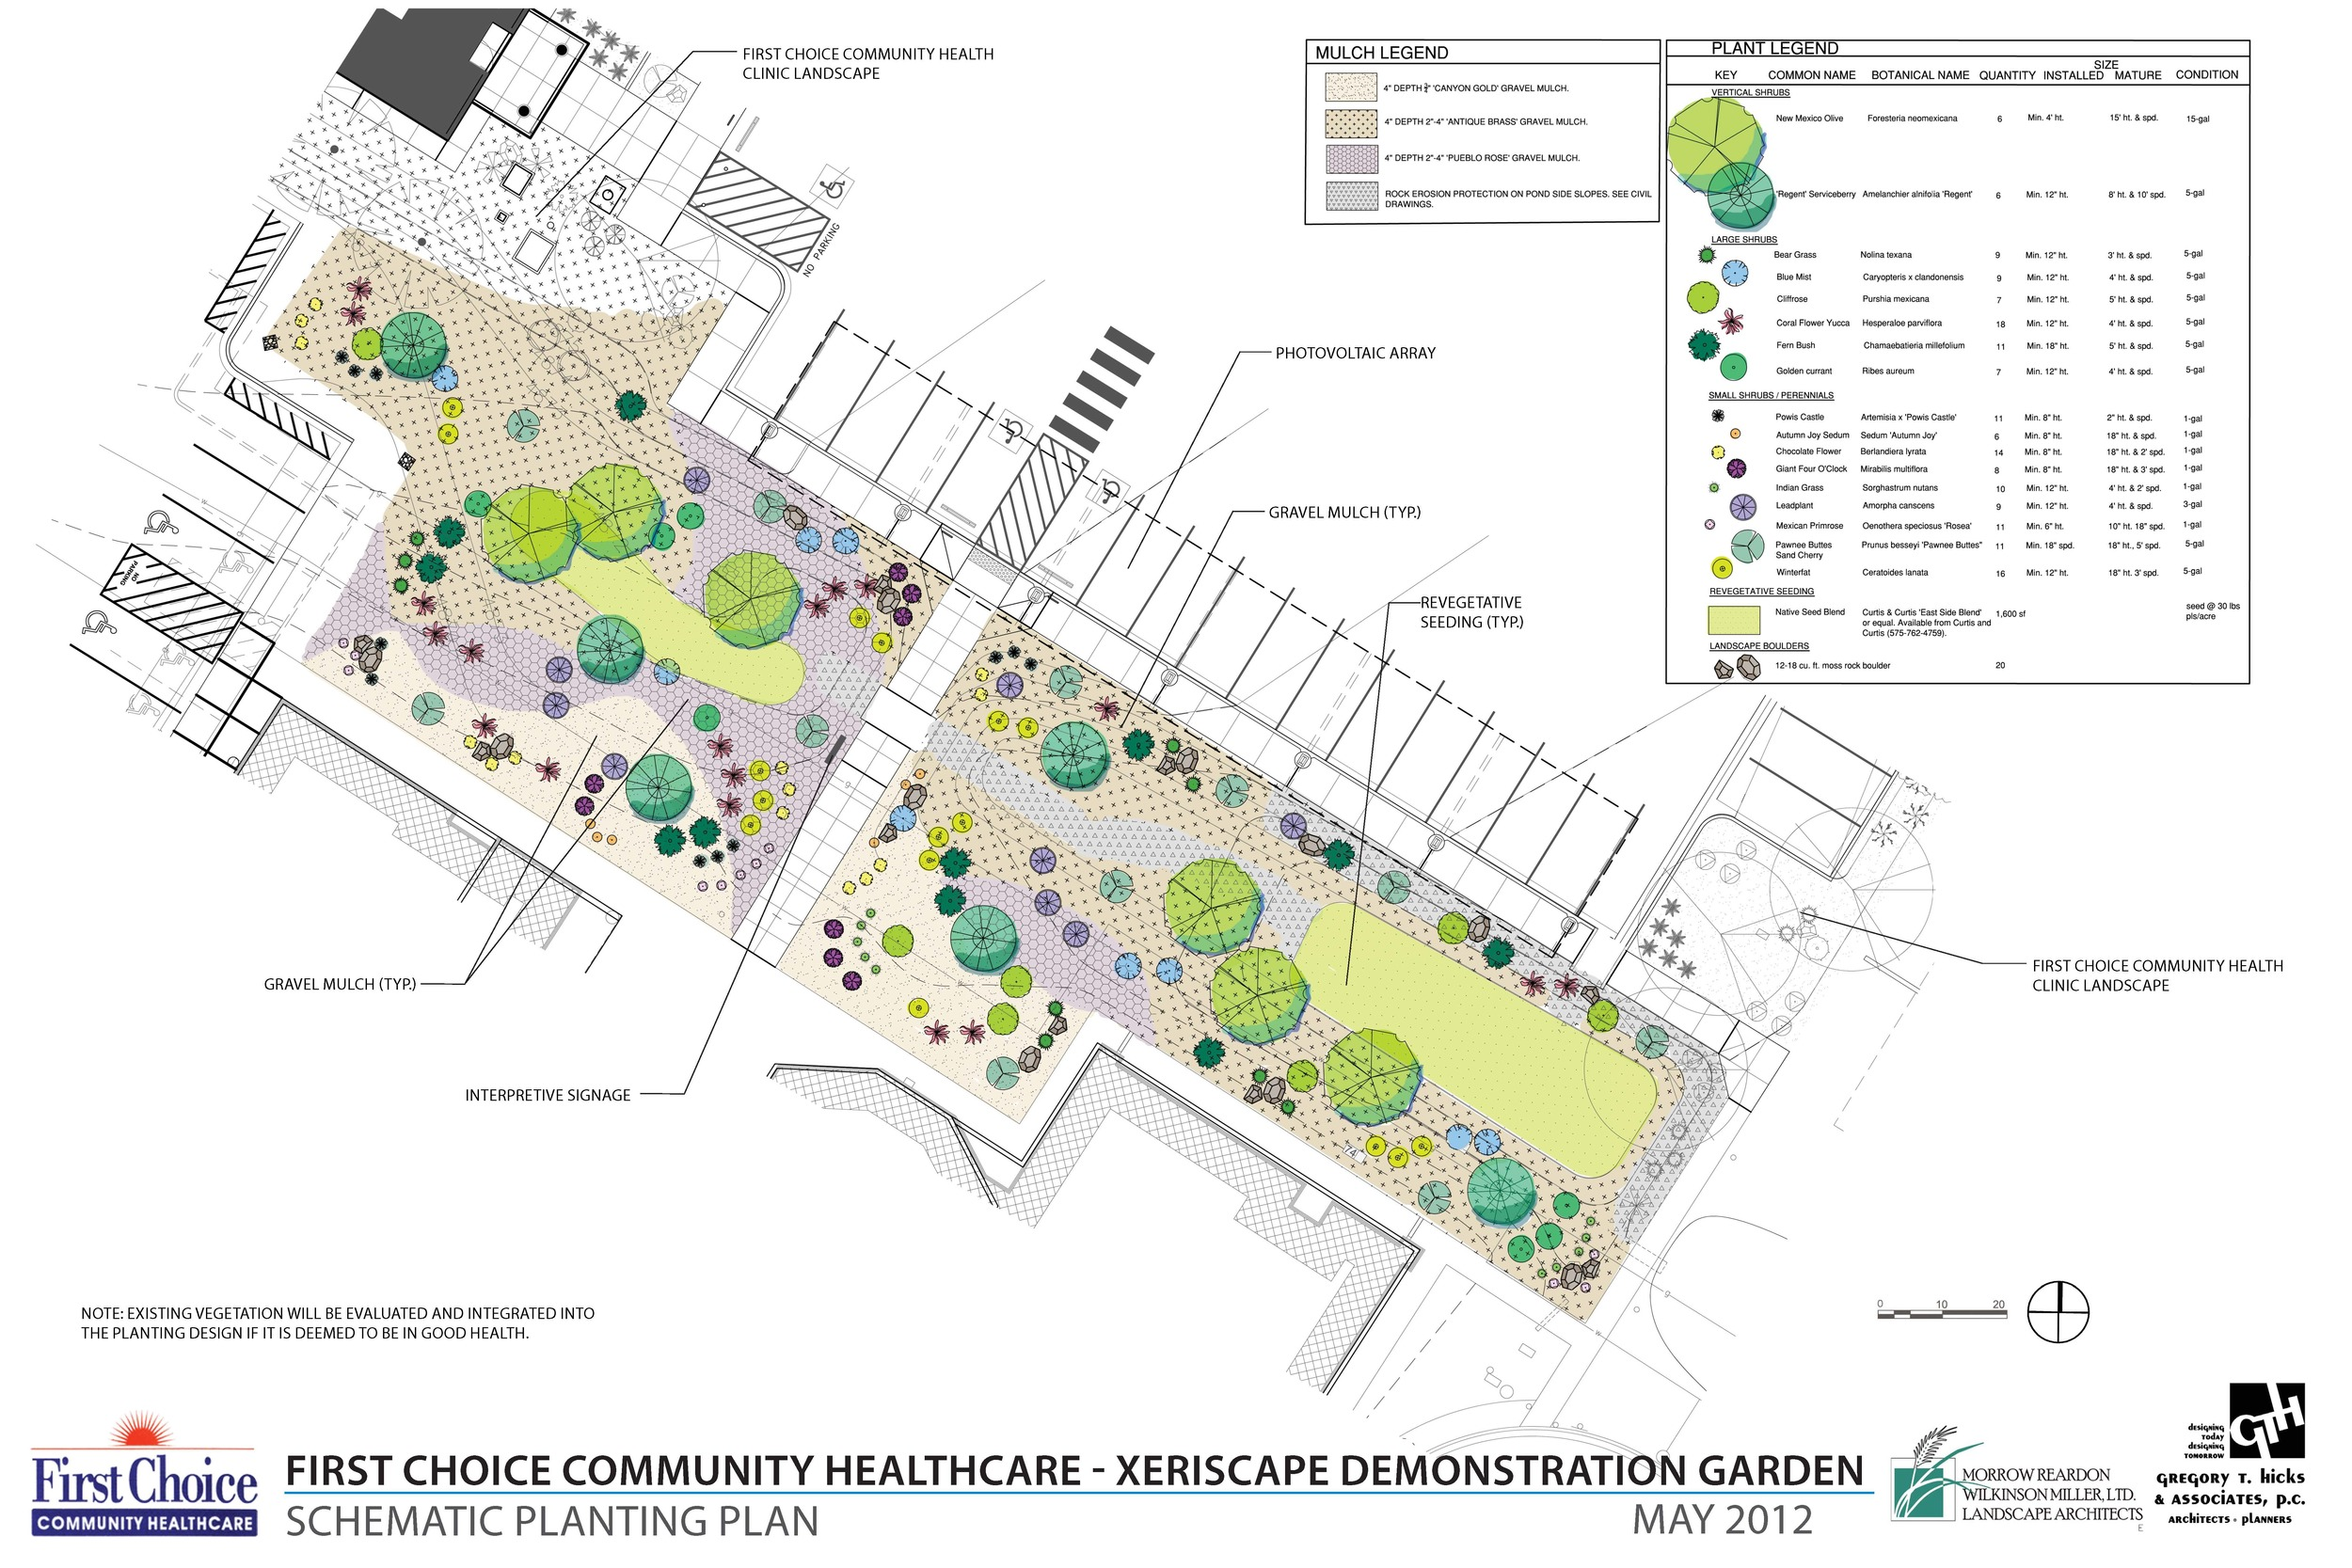 Xeriscape demonstration garden at healthcare center